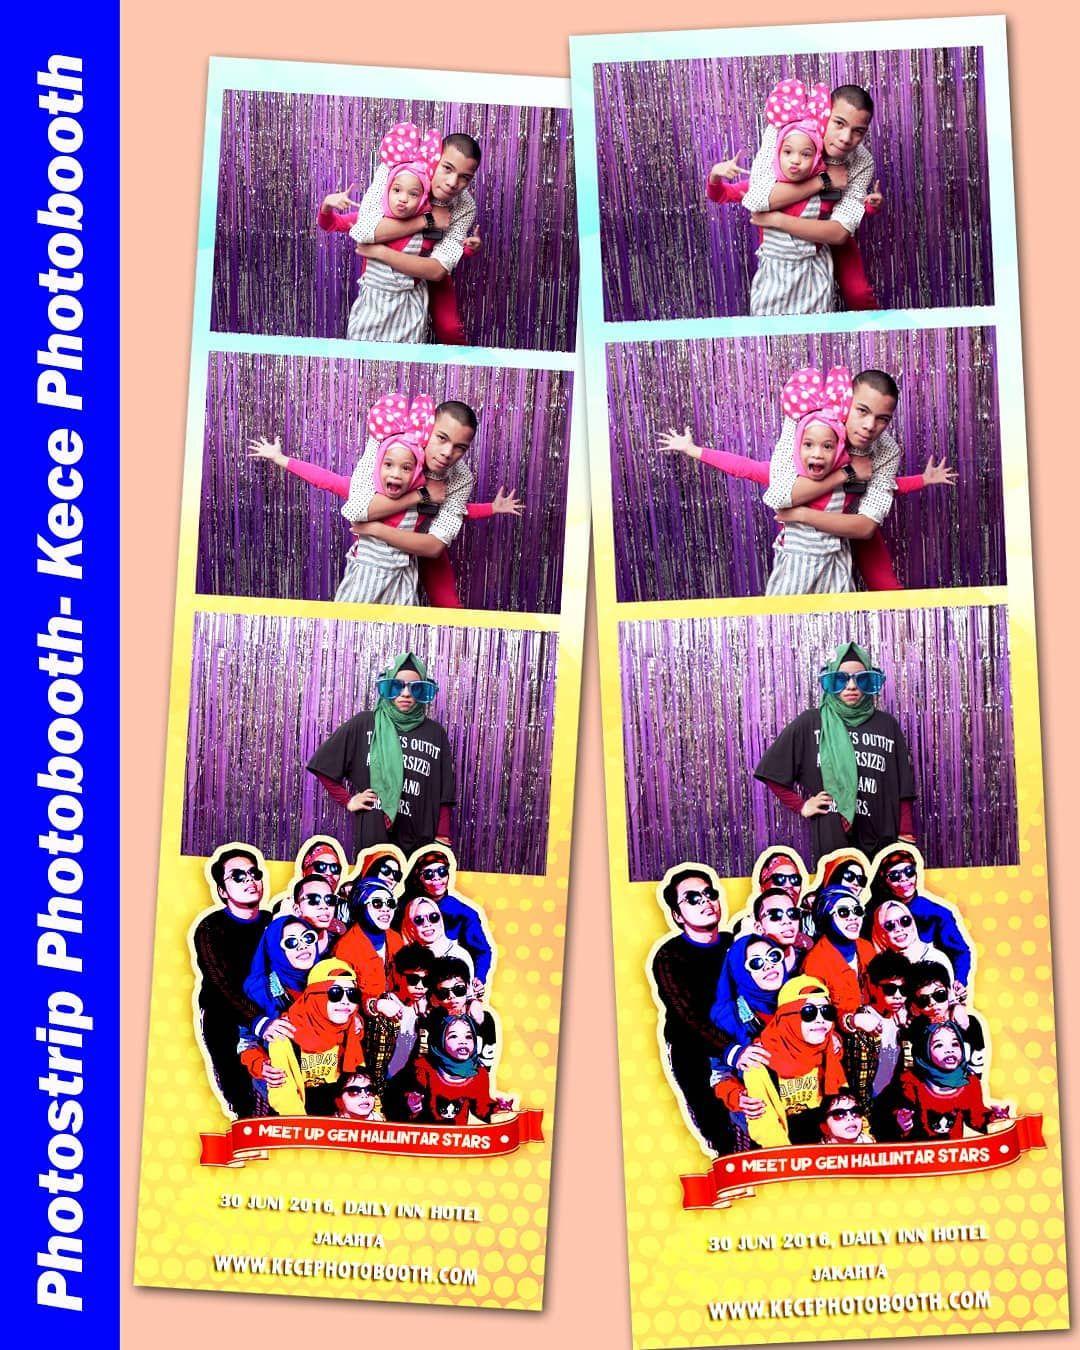 Photobooth for meet update gen halilintar stars photobooth for meet update gen halilintar stars junglespirit Image collections